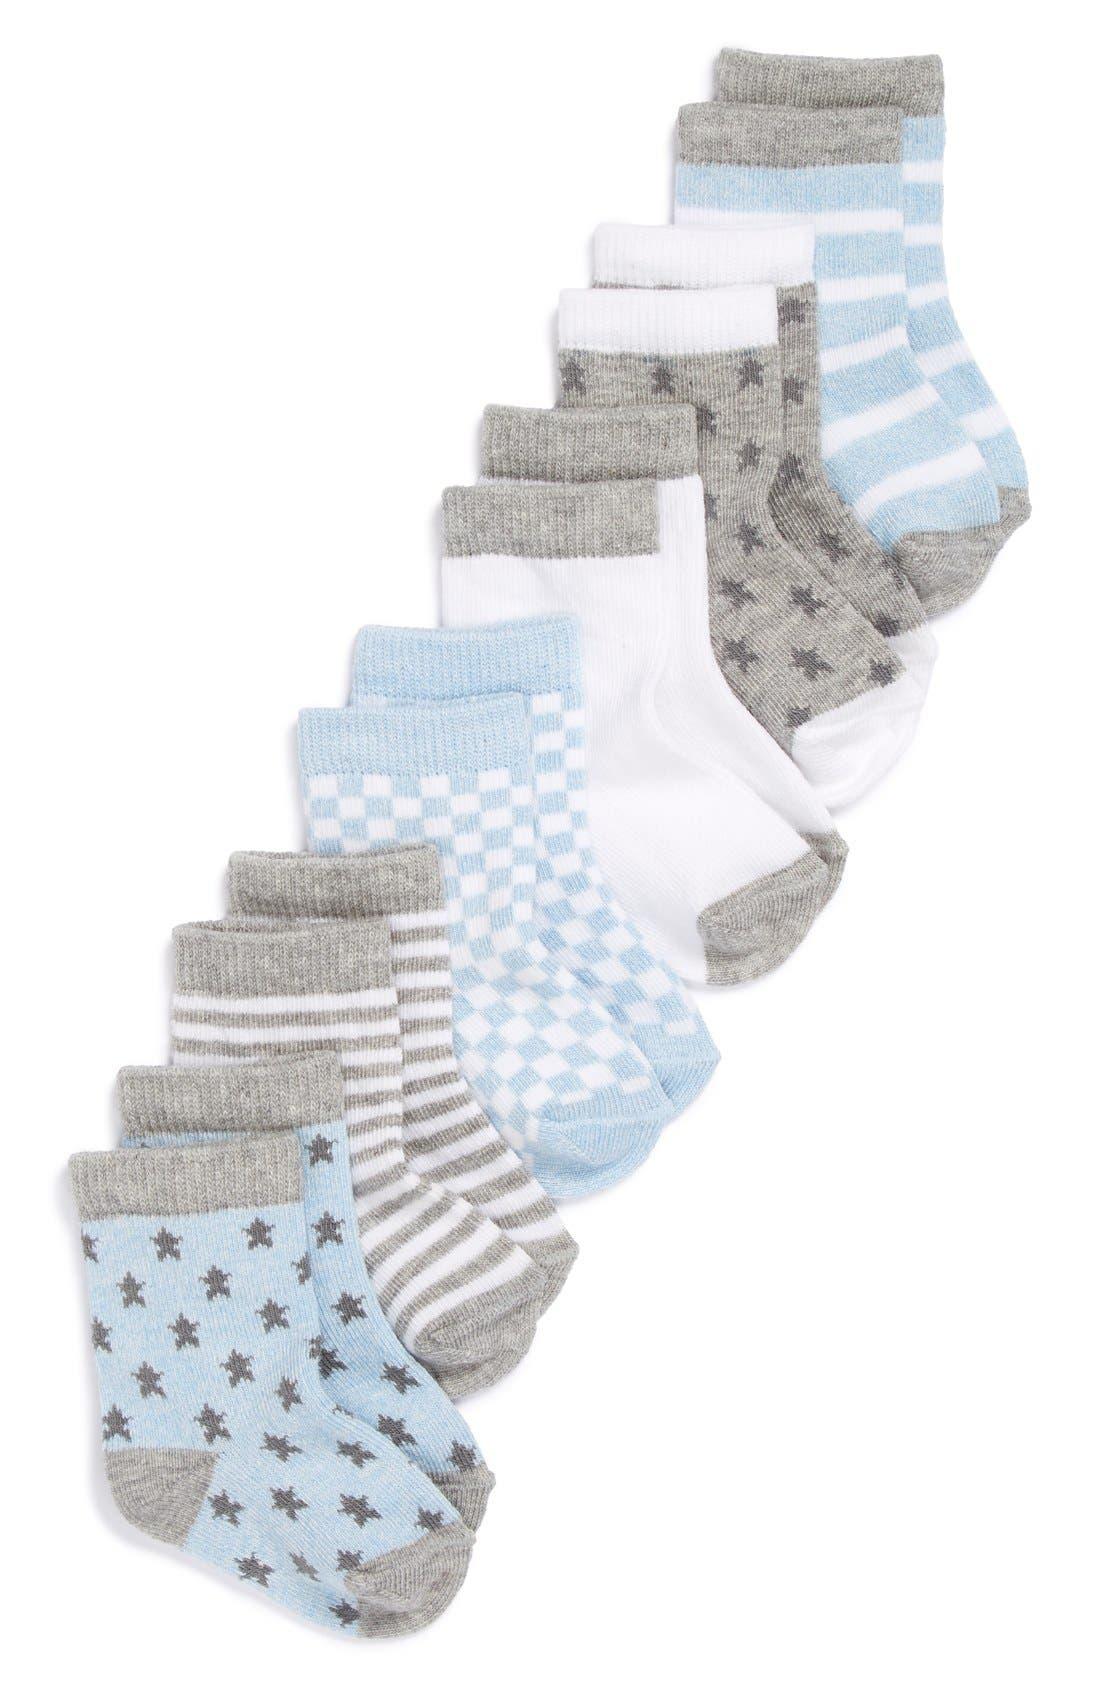 Alternate Image 1 Selected - Nordstrom Baby Crew Socks (Baby) (6-Pack)